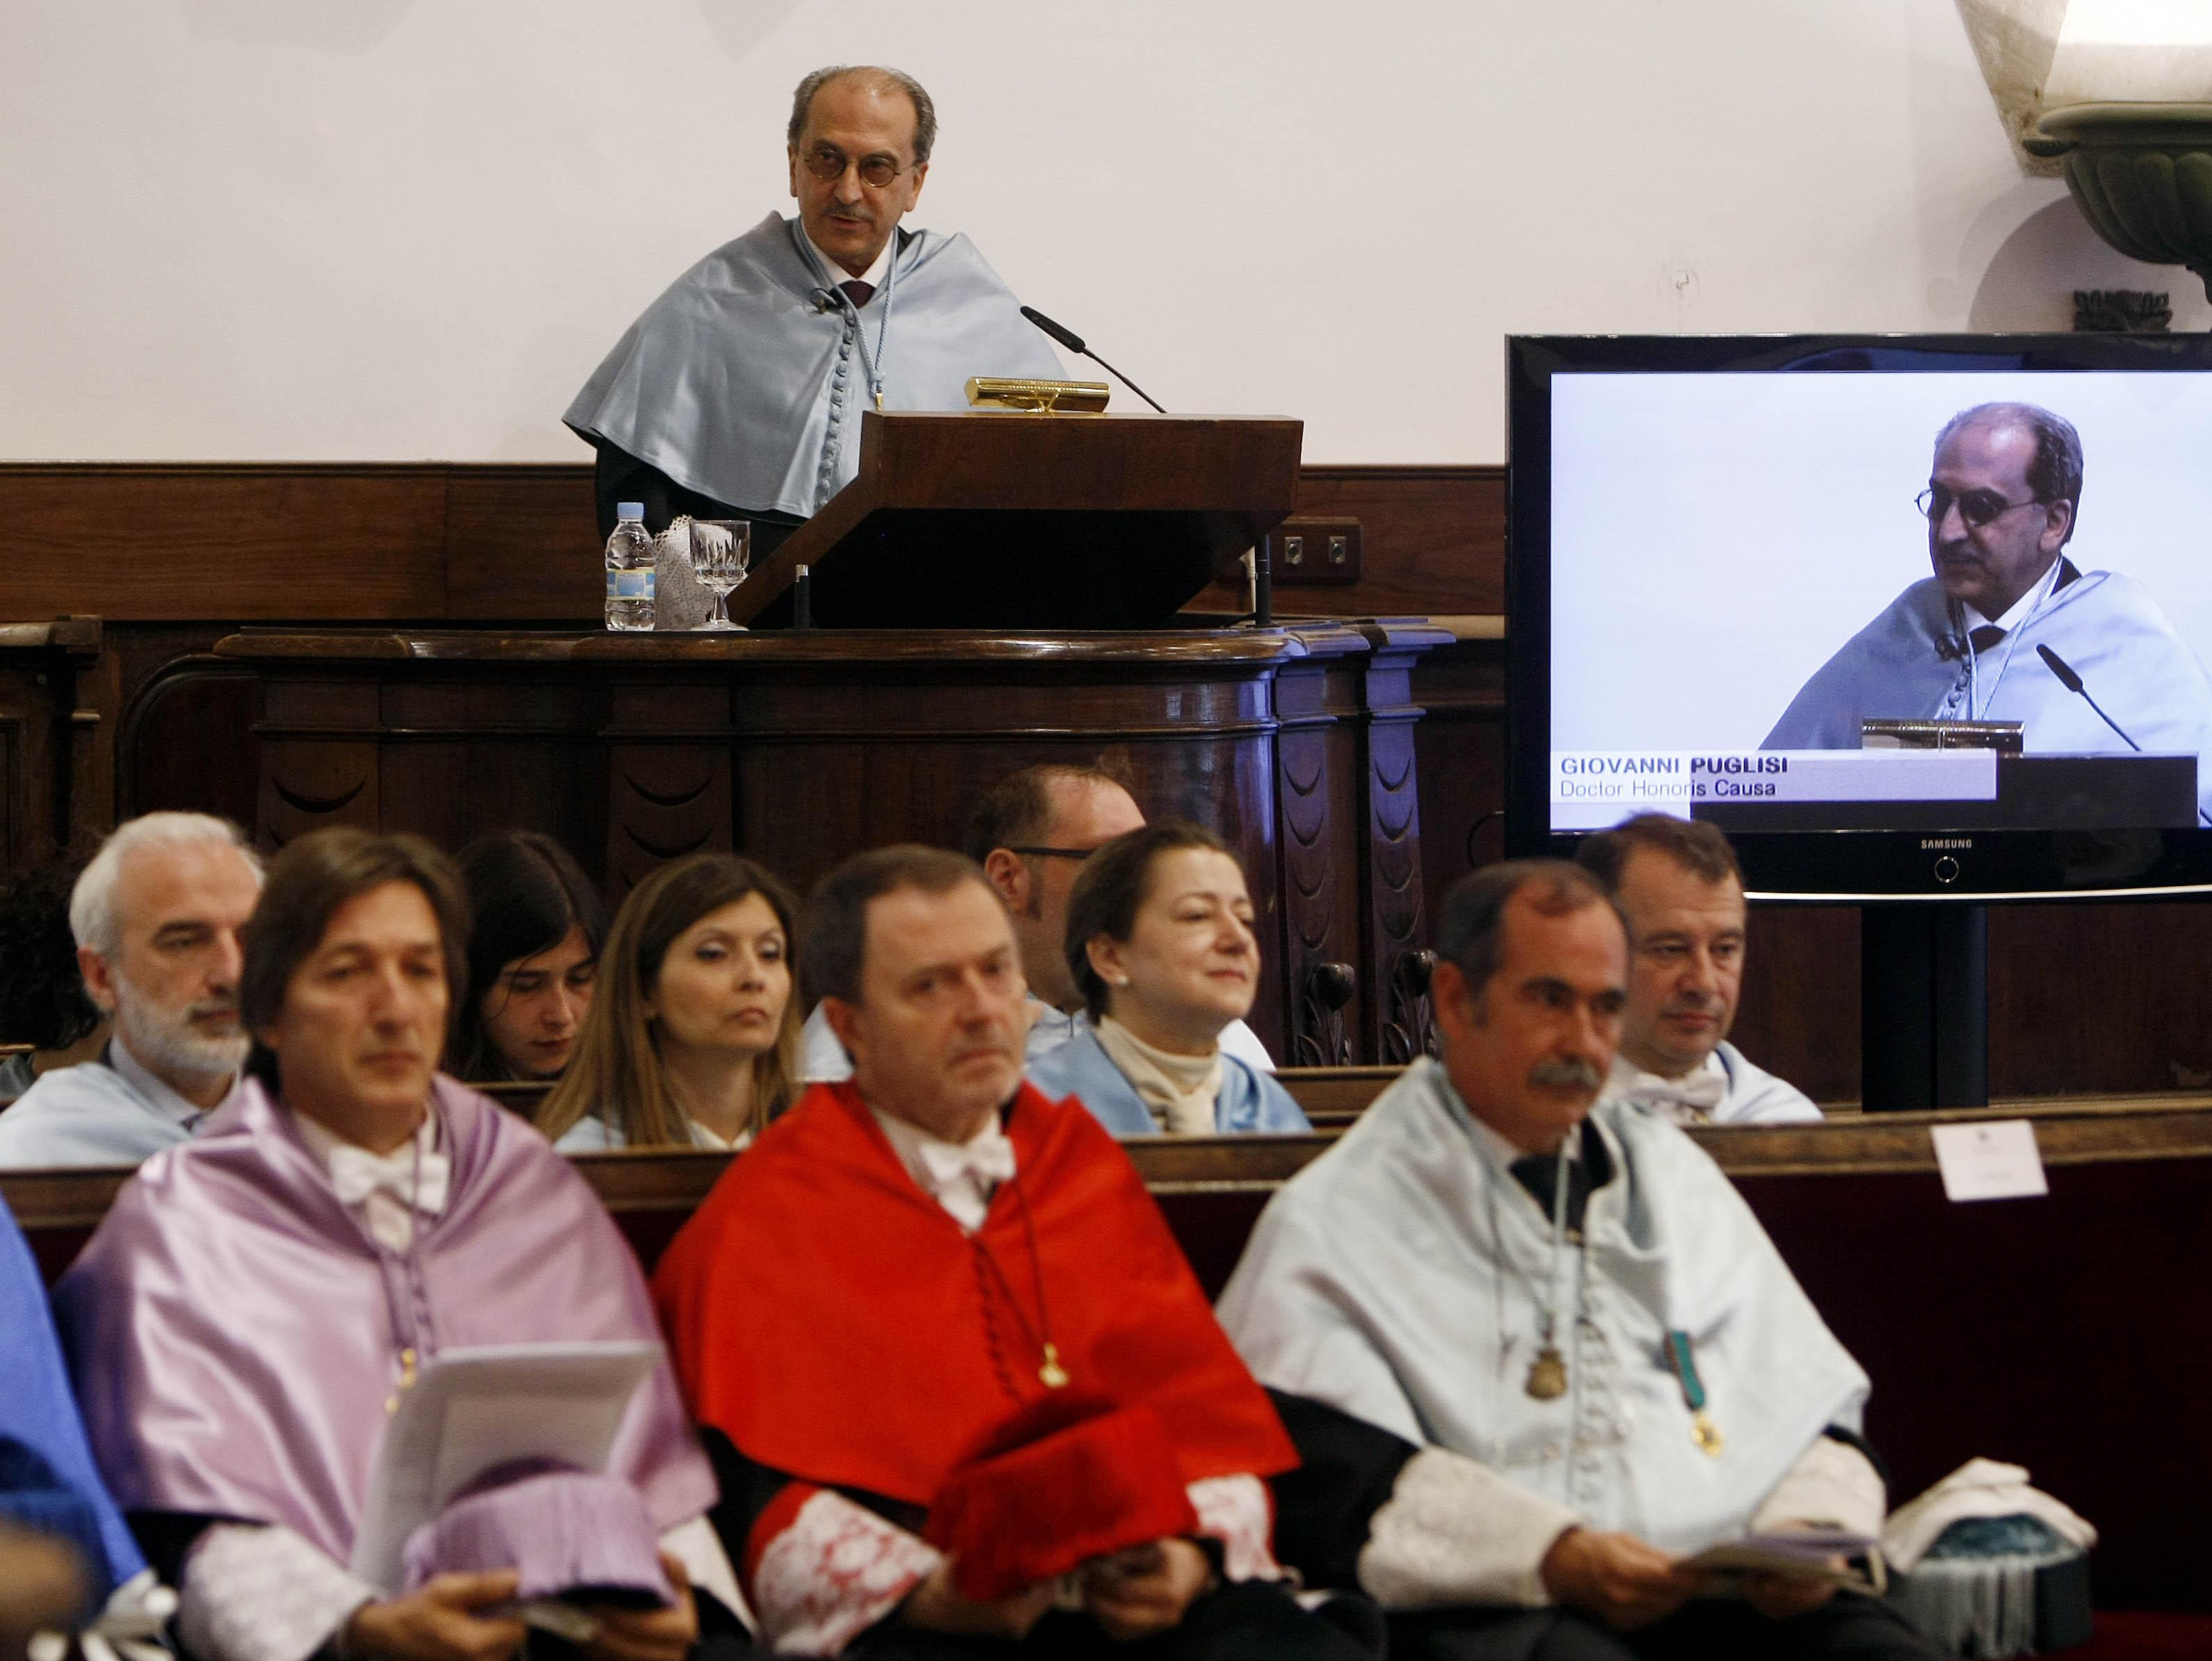 Investidura Doctor honoris causa de Giovanni Puglisi